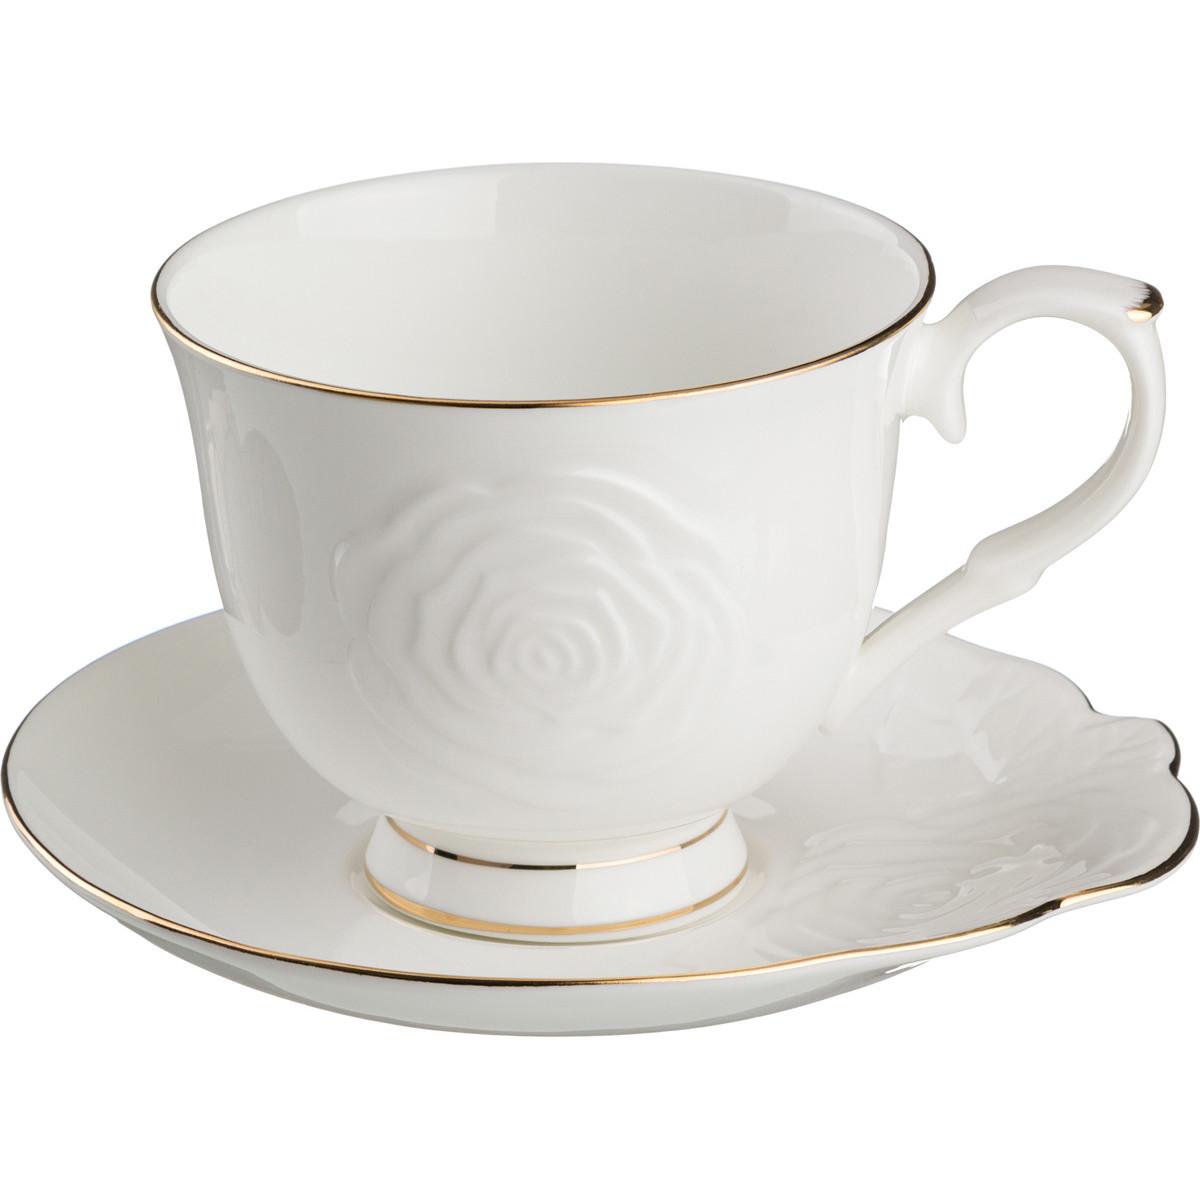 {} Lefard Чайная пара Blanco (450 мл) чайная пара с крышкой кобальтовая сетка форма подарочная 2 ифз